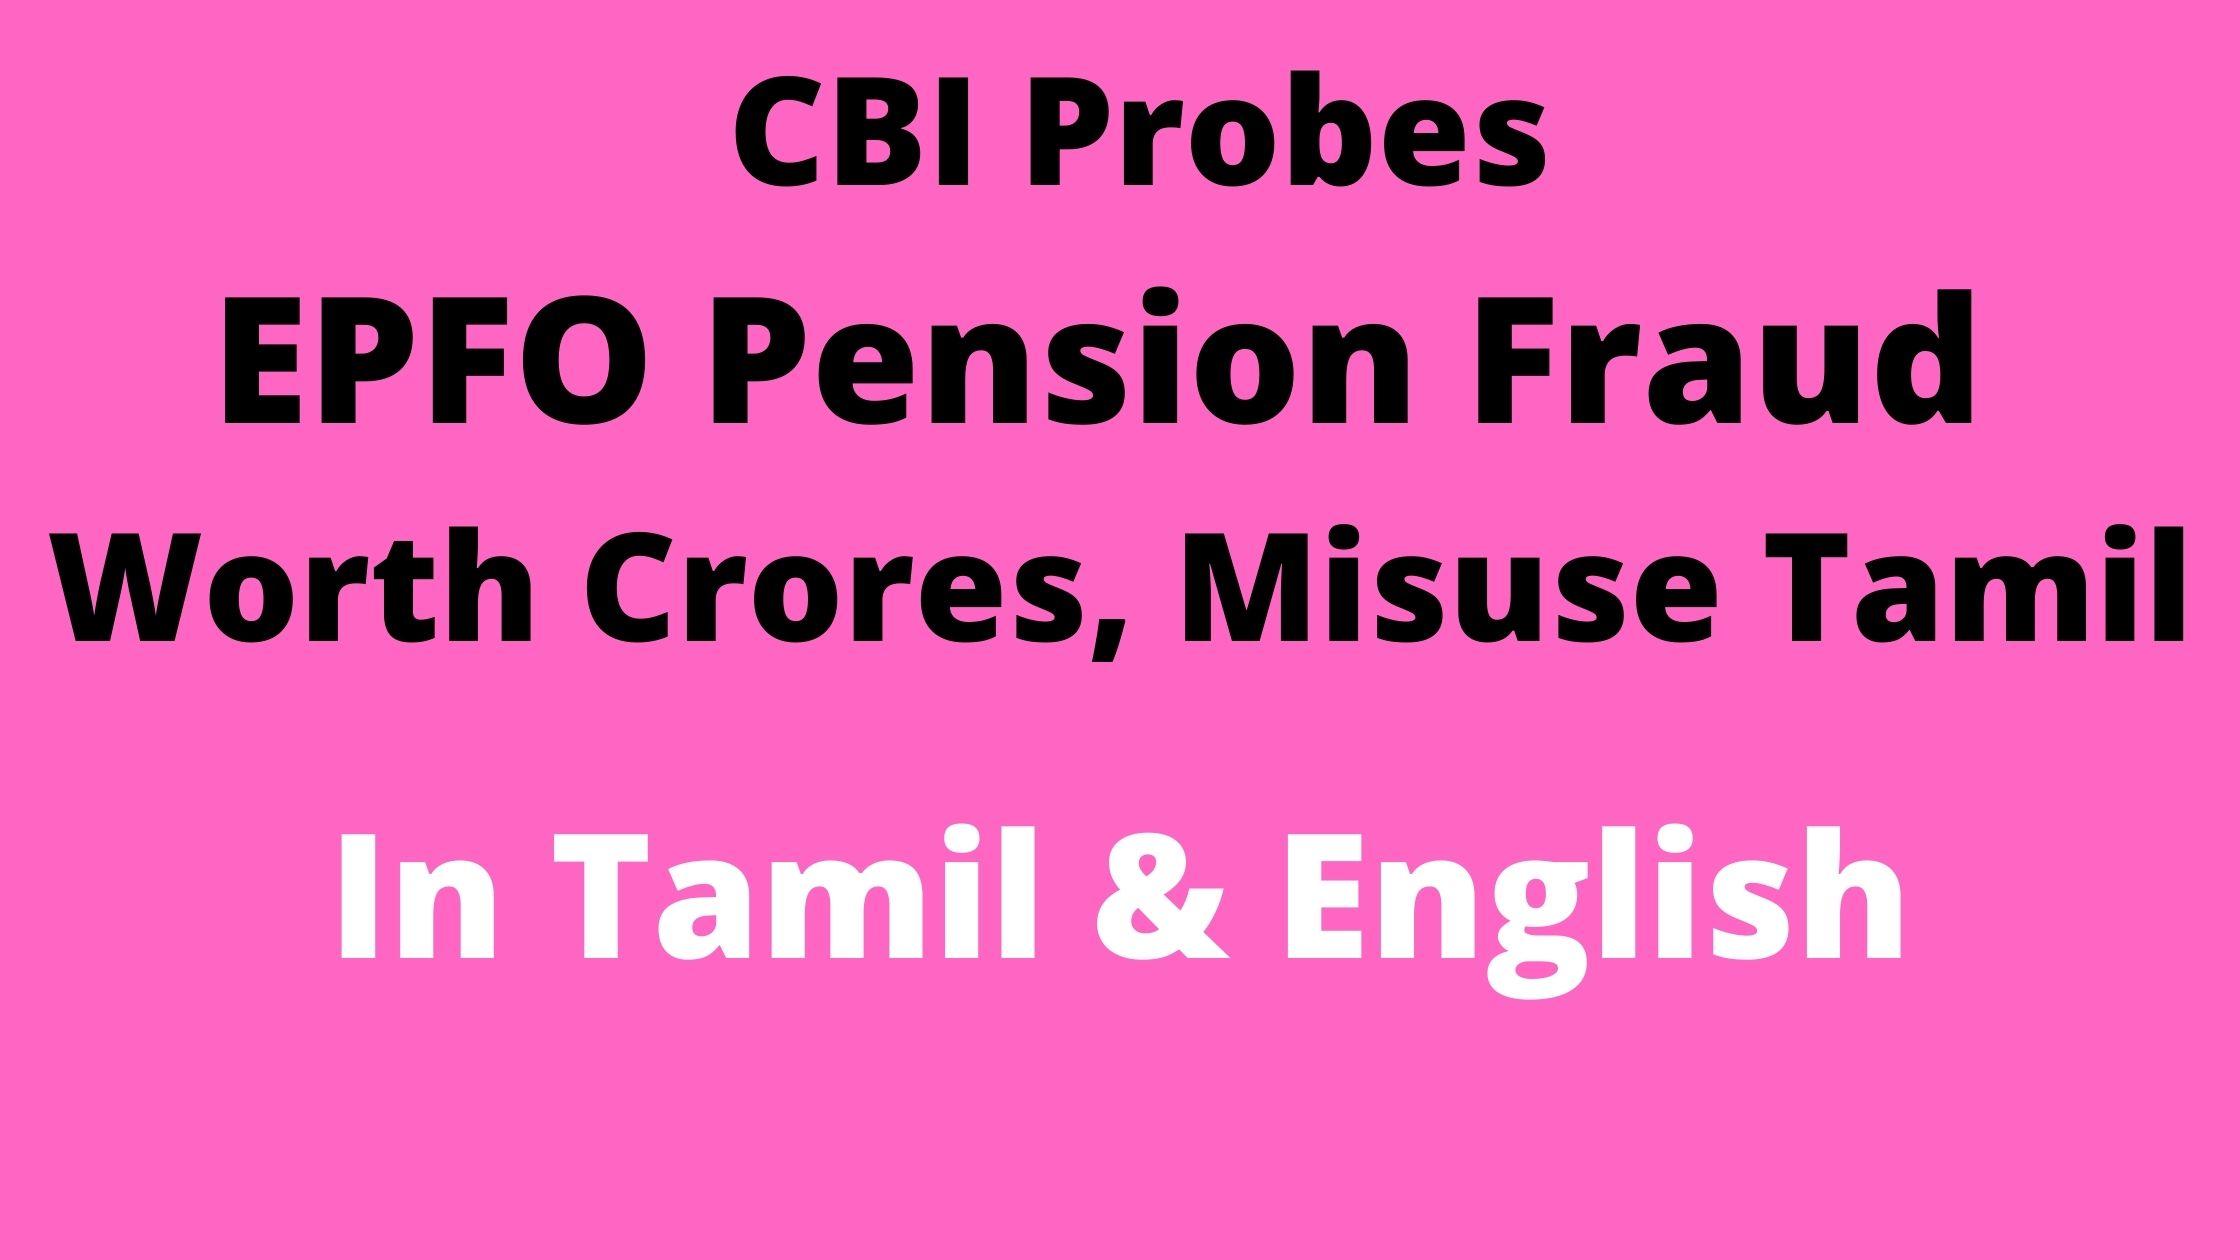 CBI Probes EPFO Pension Fraud